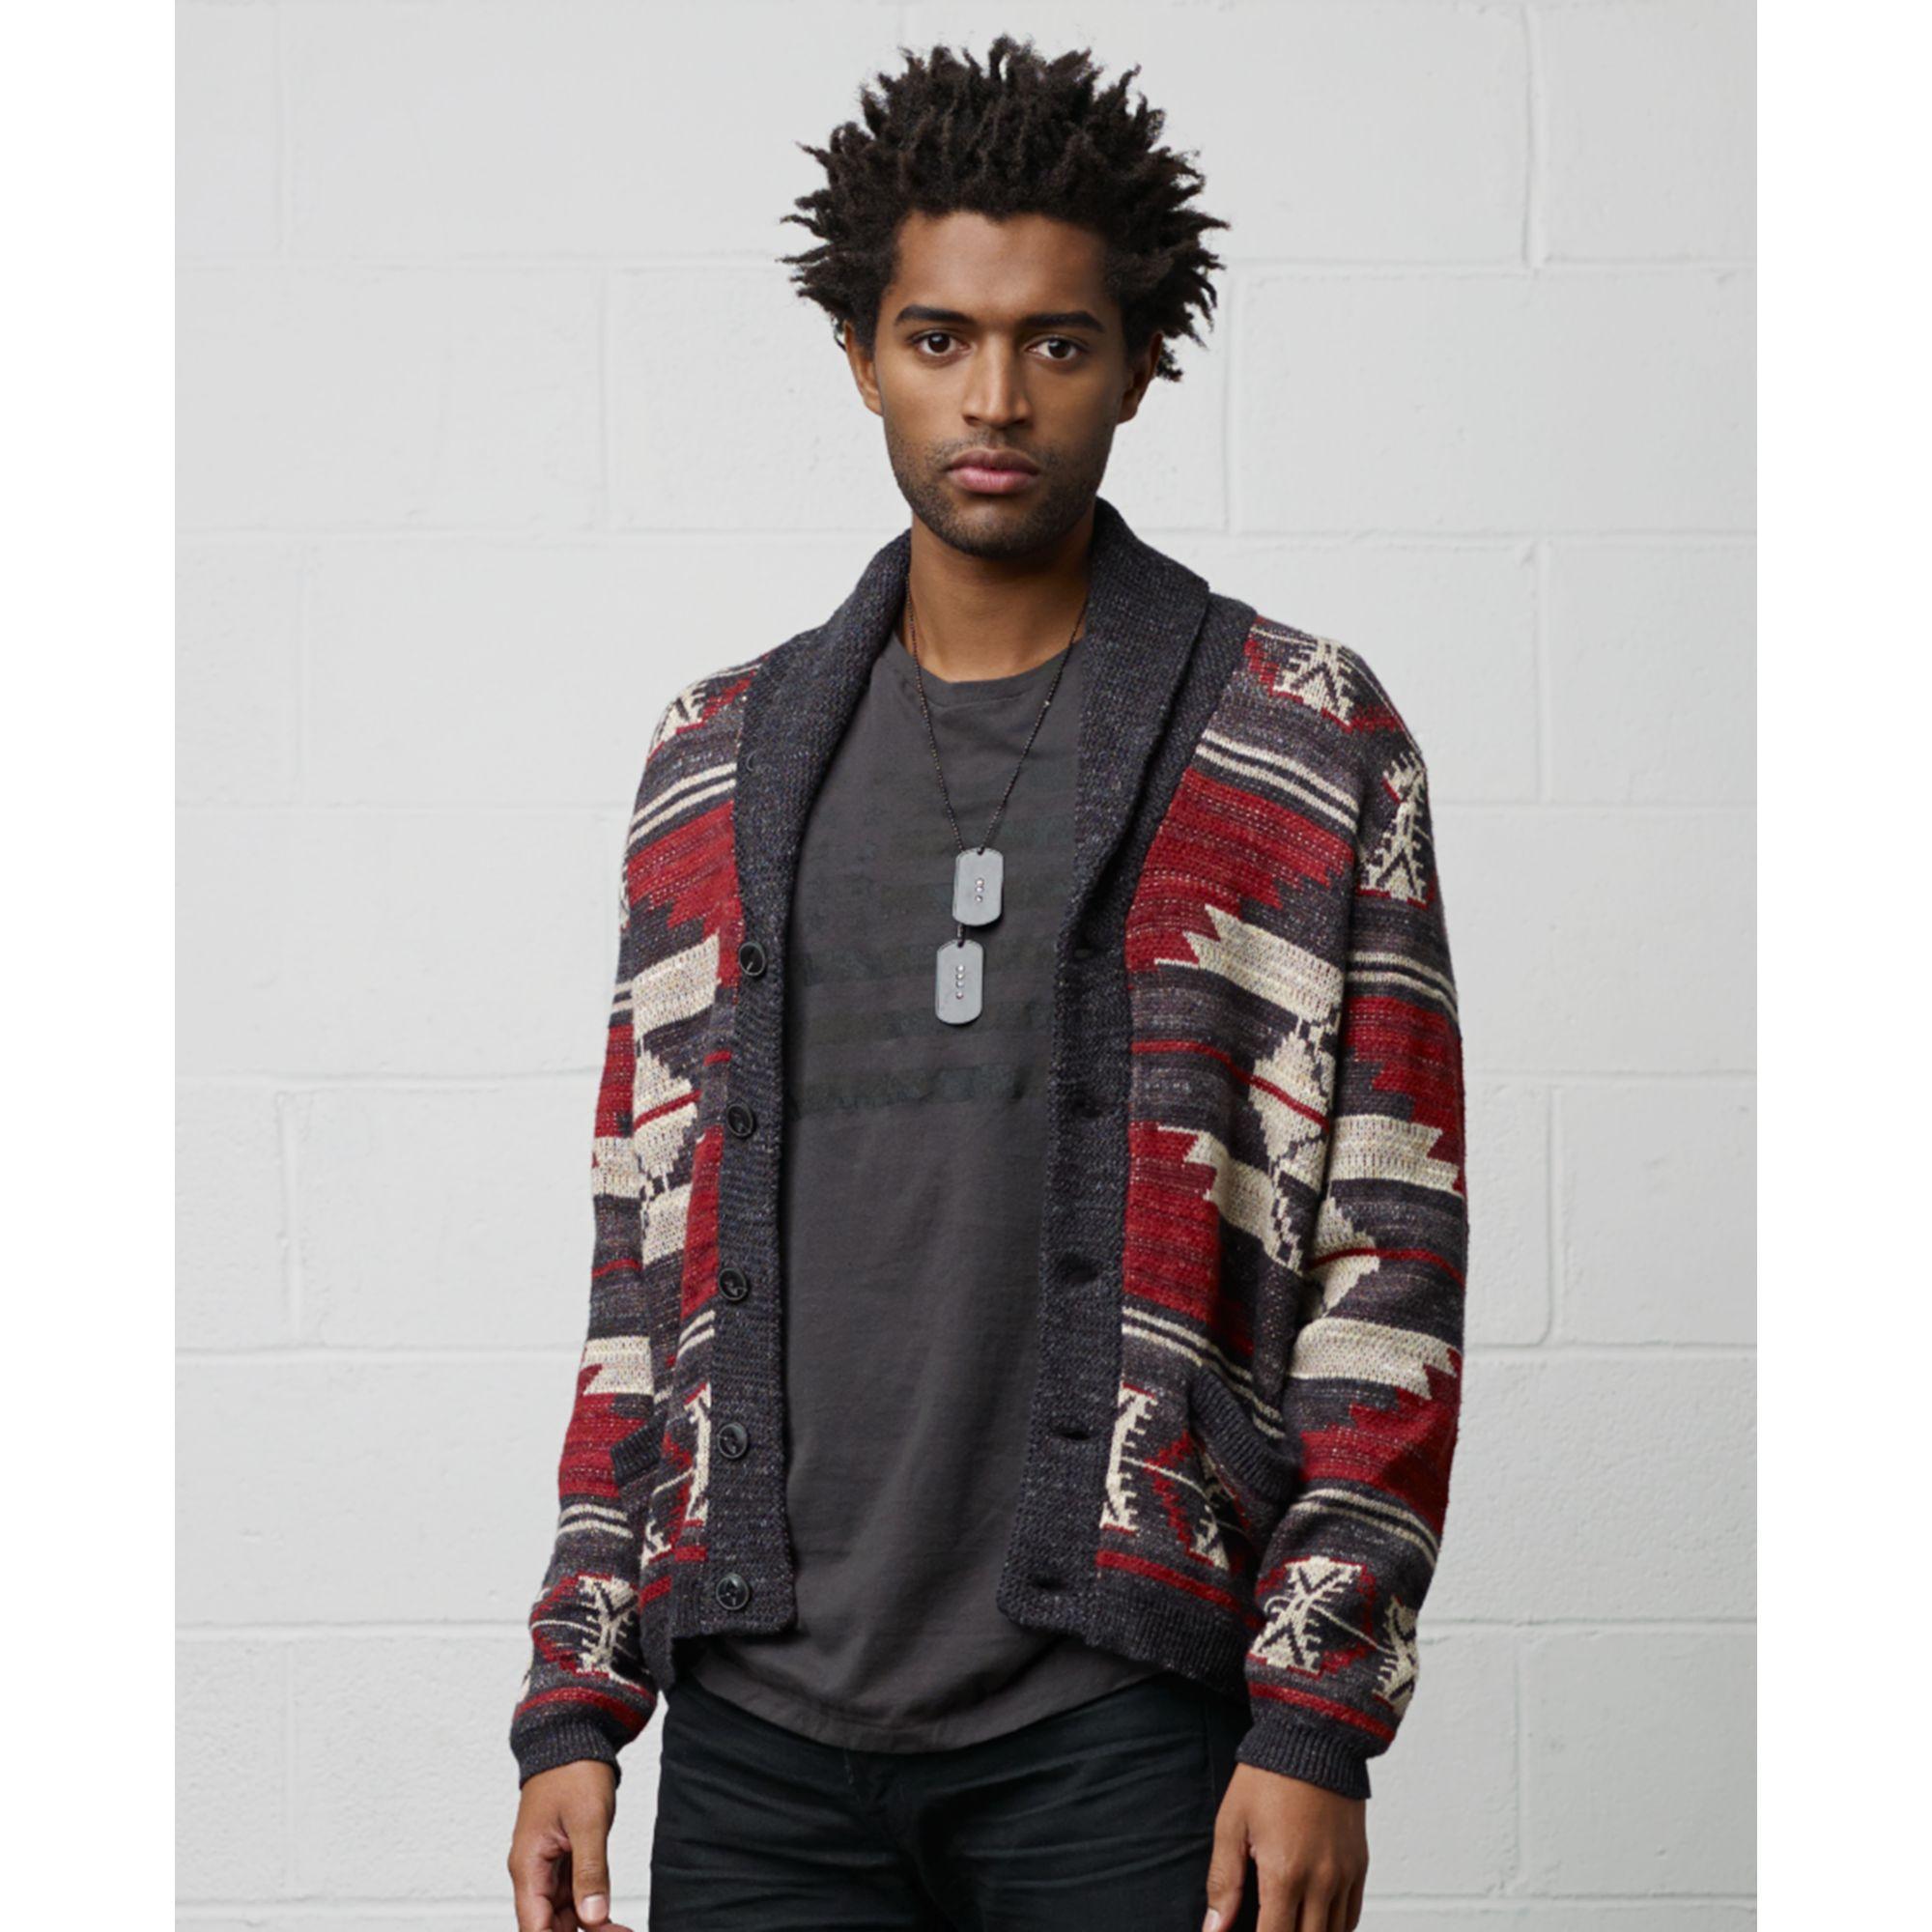 resumen Bermad visto ropa  Denim & Supply Ralph Lauren Southwestern Shawl Collar Cardigan in Red for  Men - Lyst